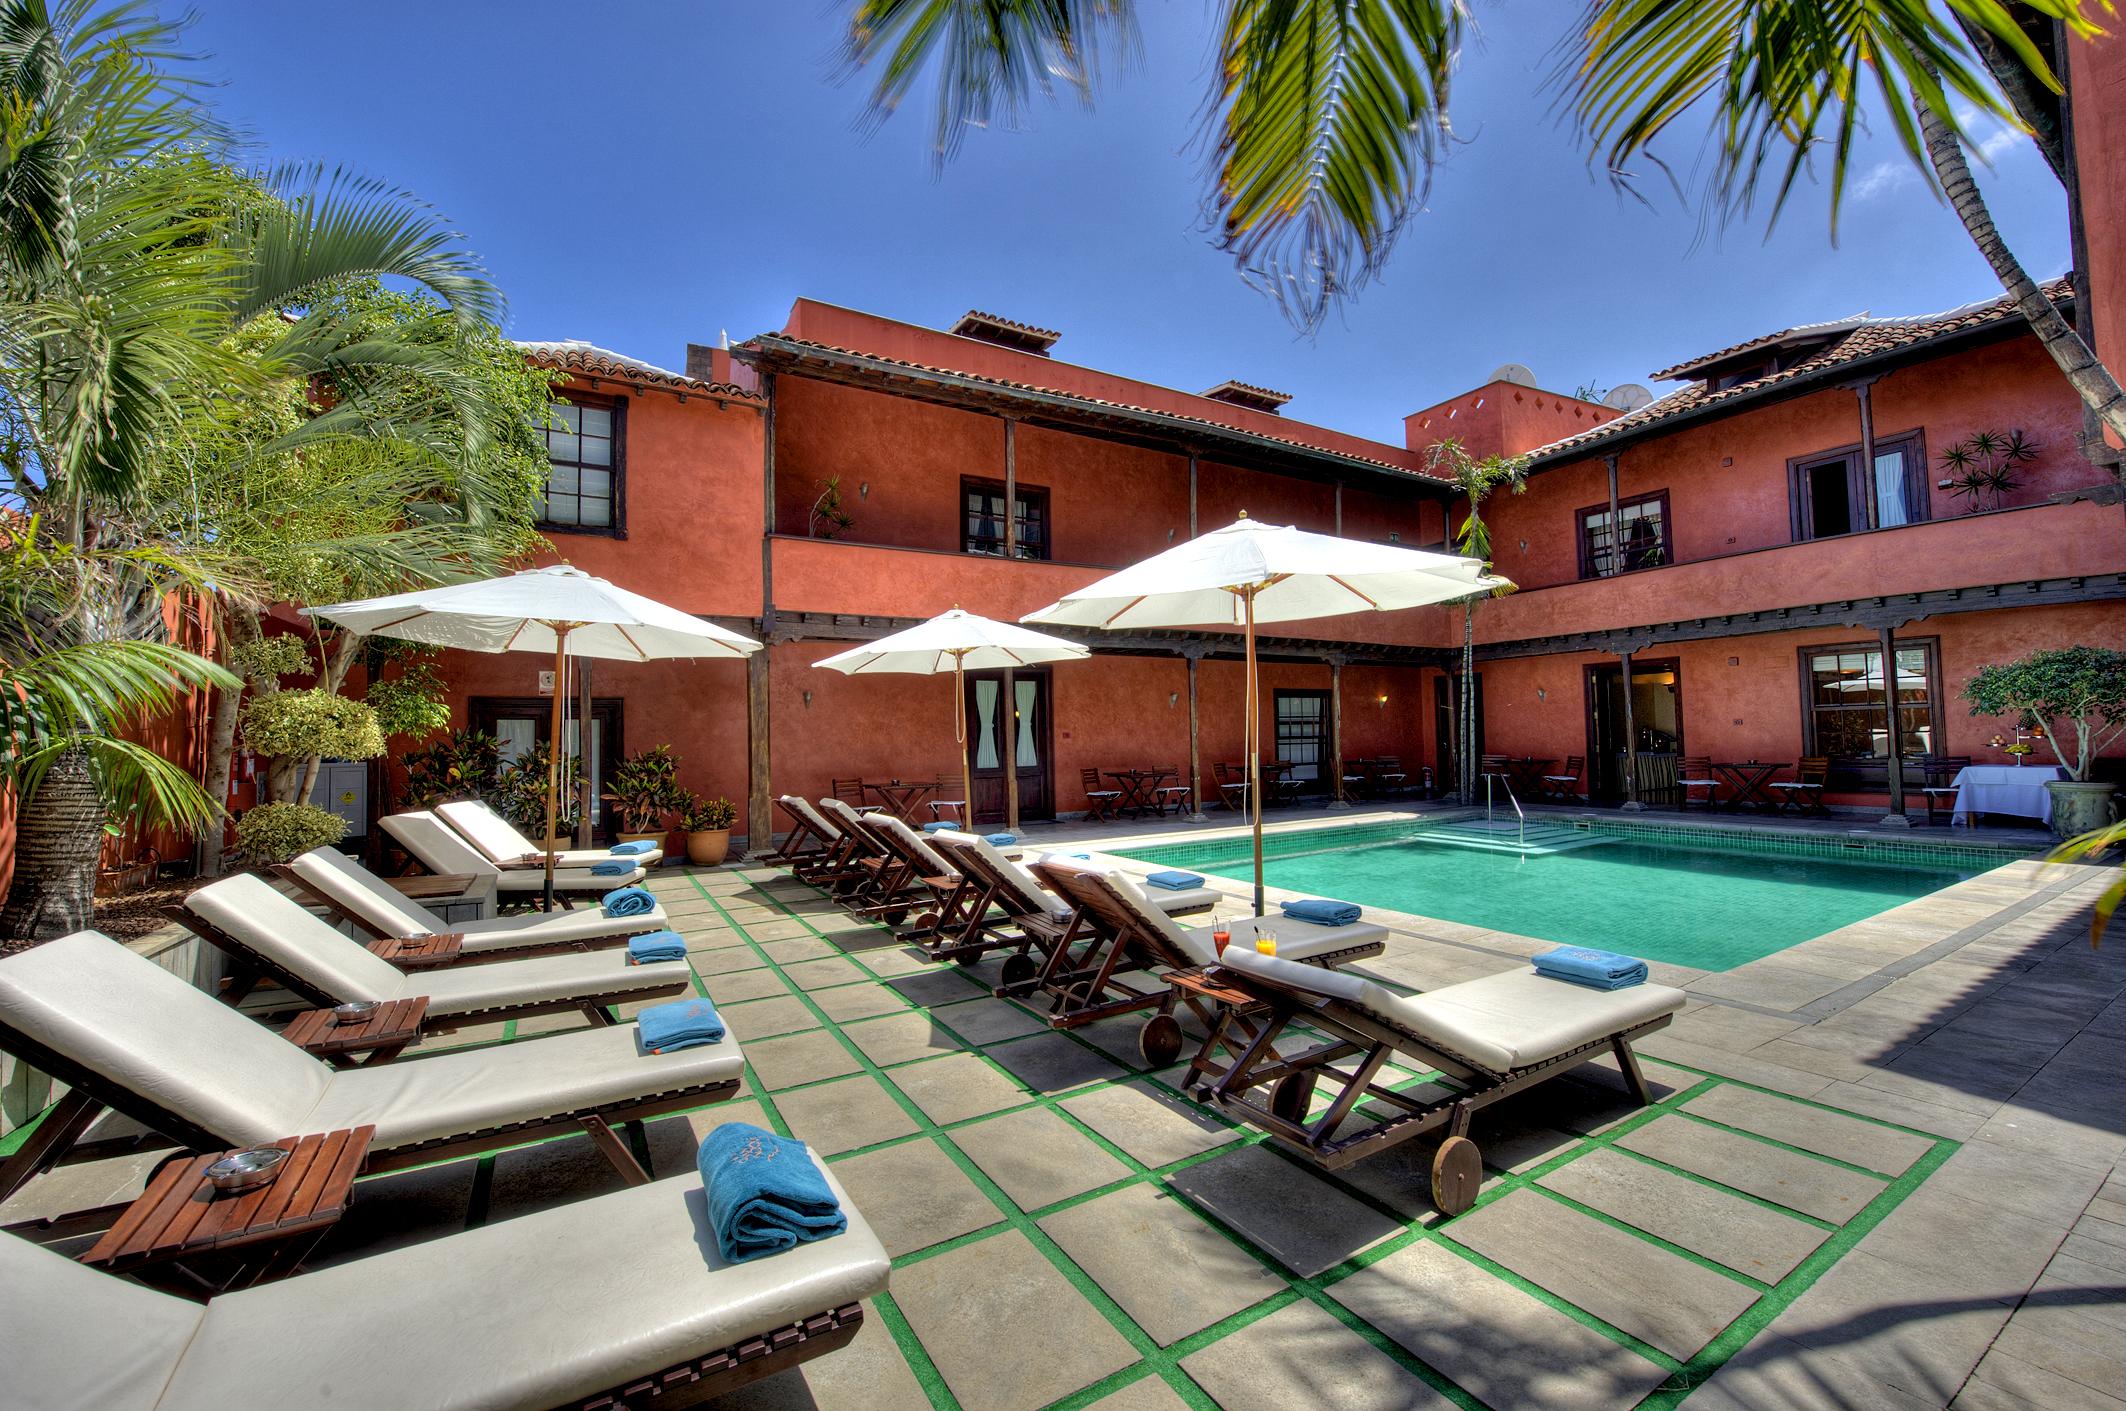 <strong>Hoteles Rurales en Tenerife</strong>